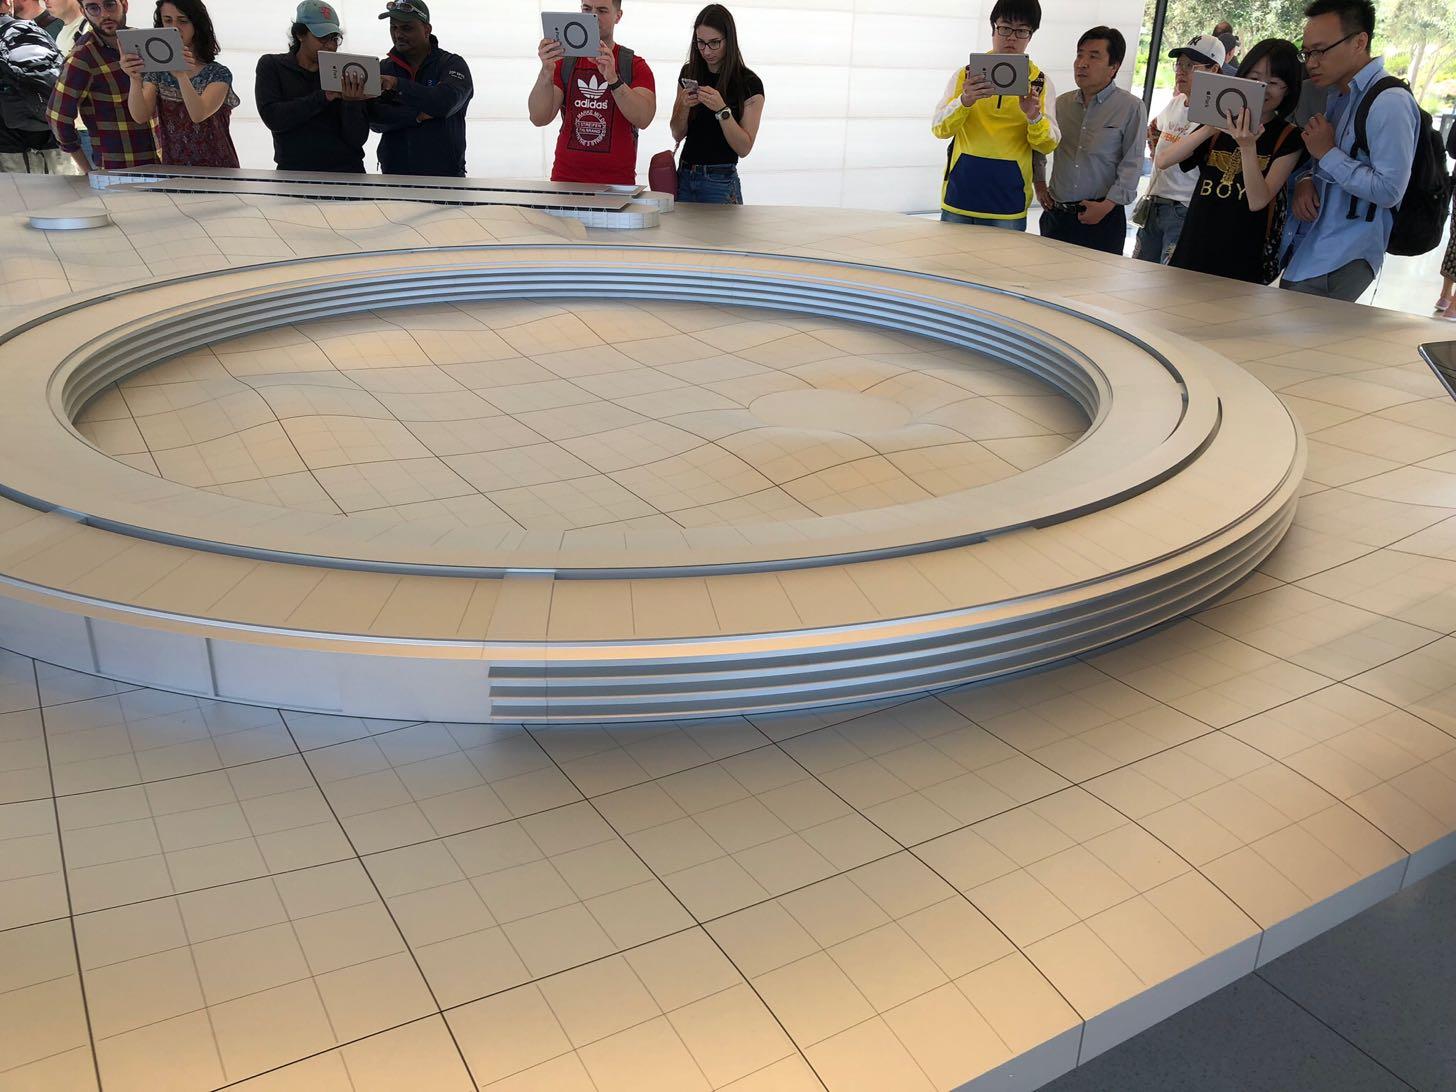 Apple Parkビジターセンターにある模型